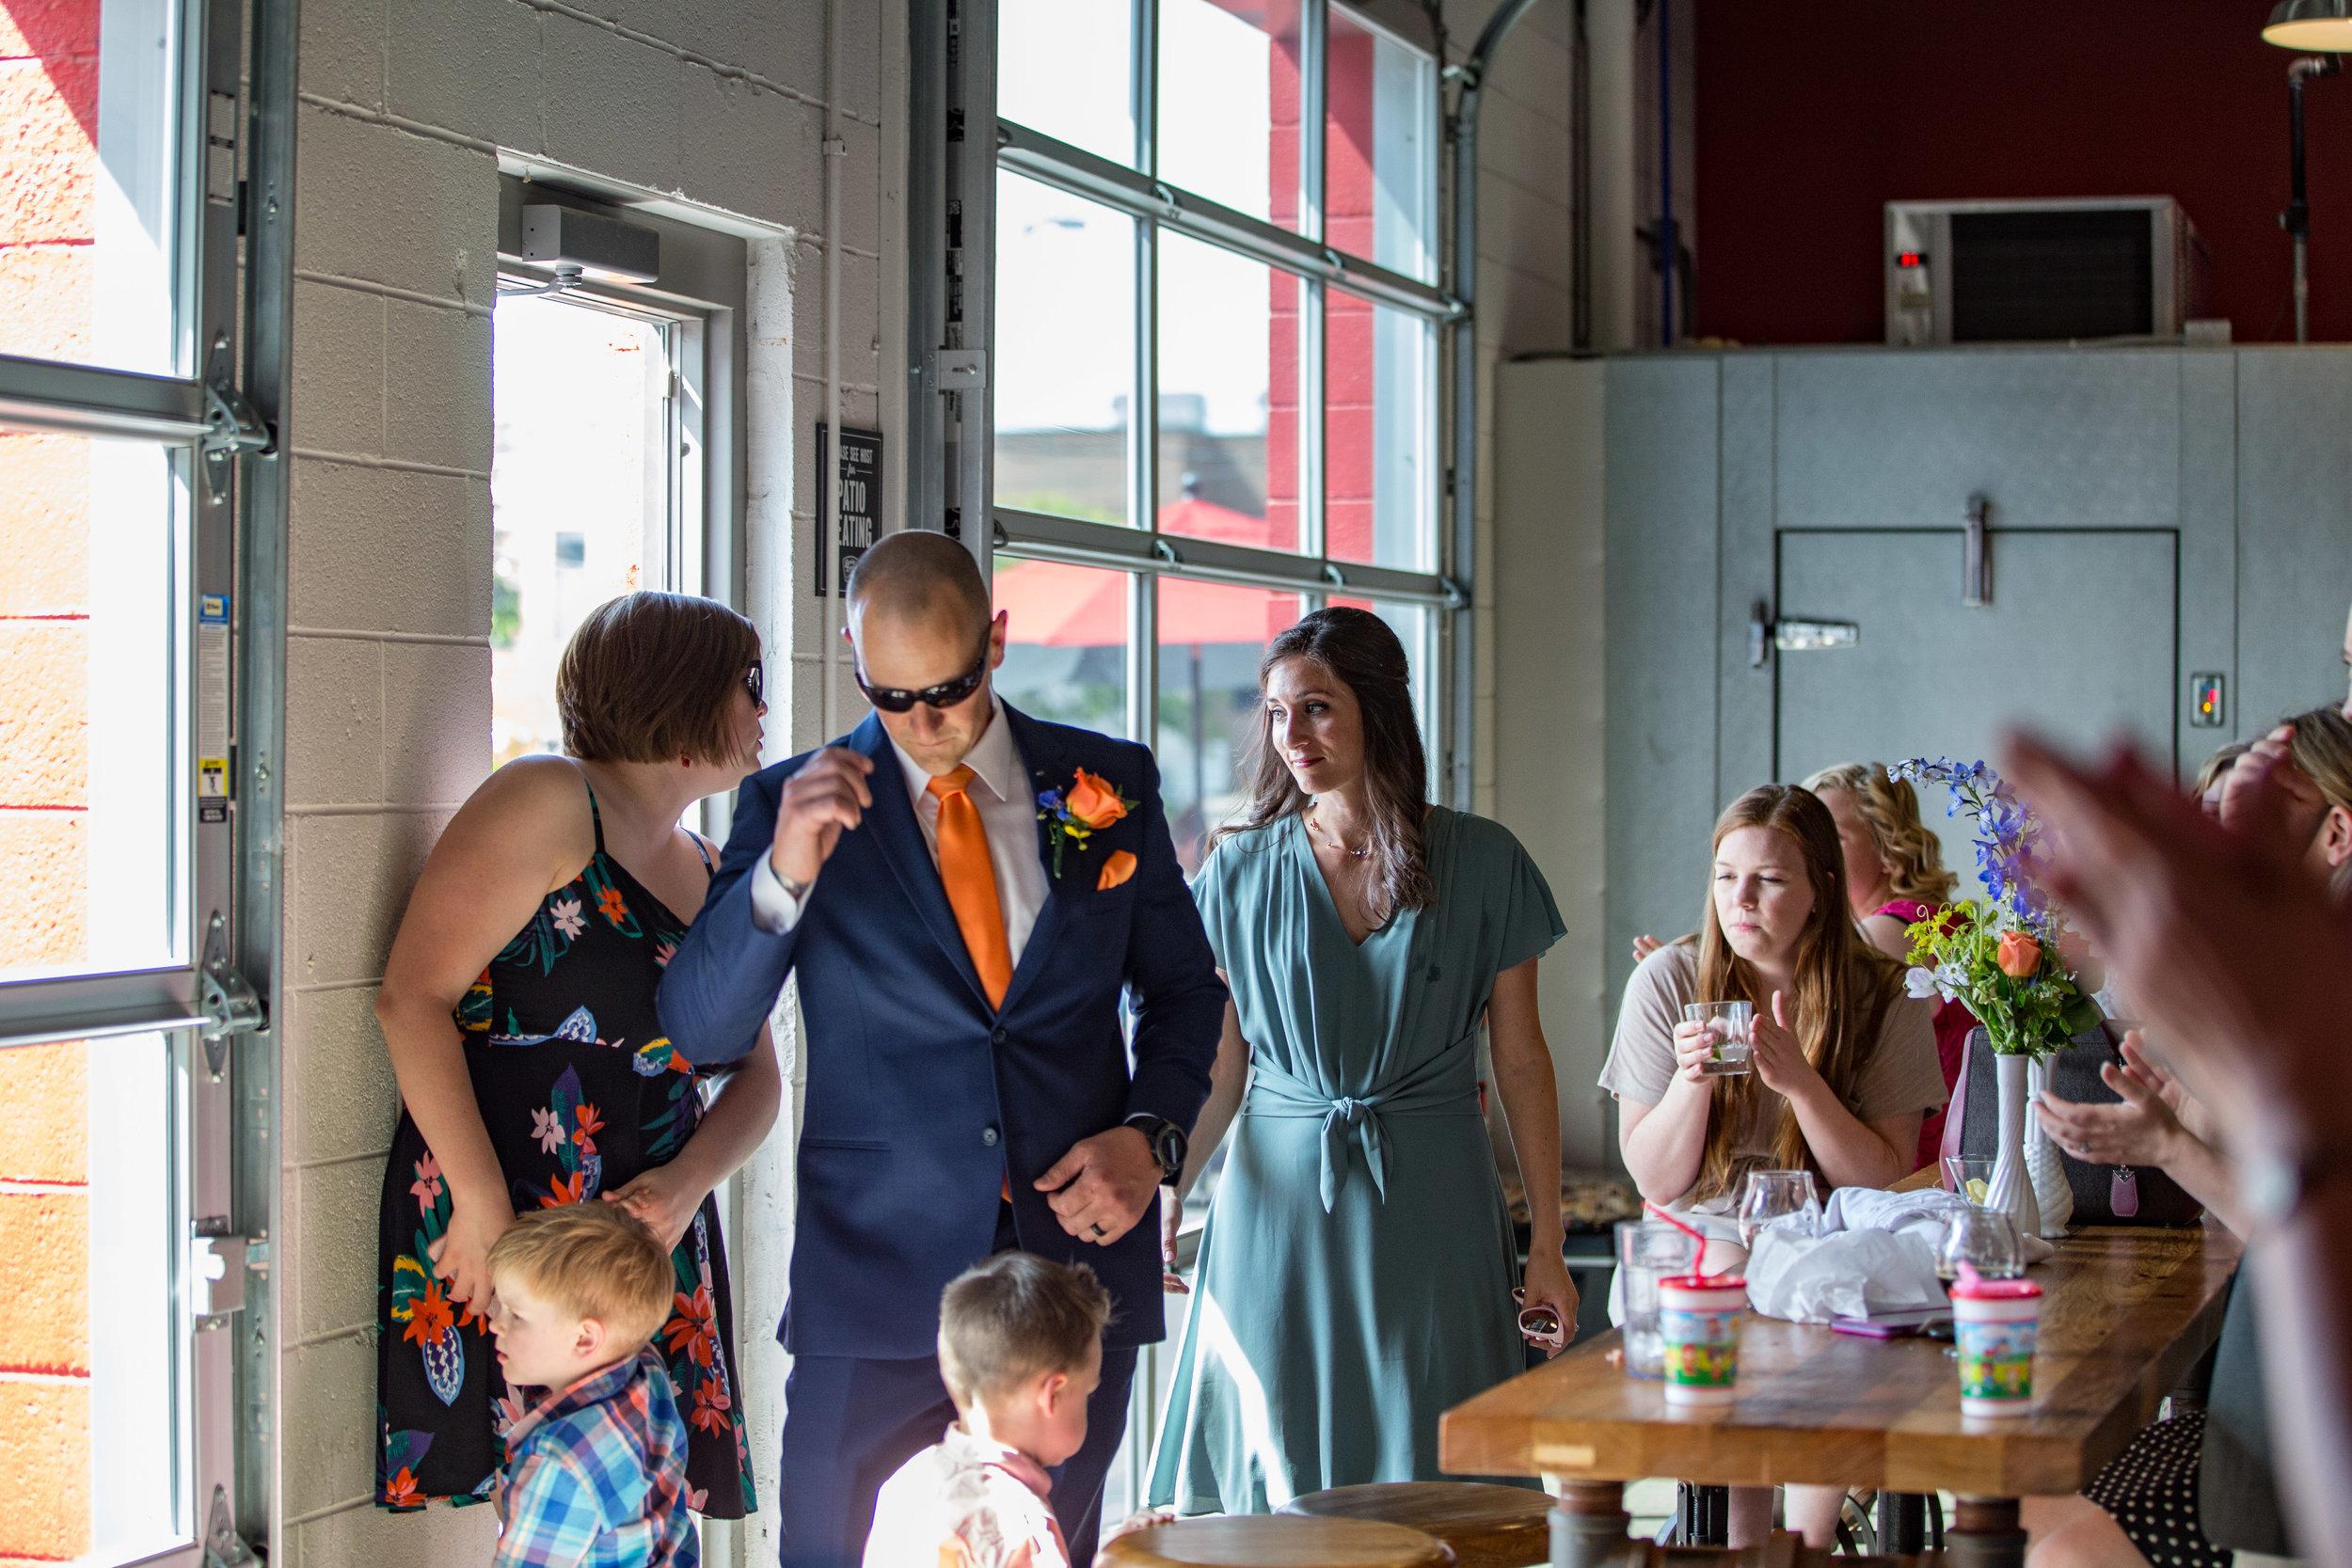 Natalie and Dallas Mooney Wedding 6-8-19_Tania Watt Photography-402.jpg